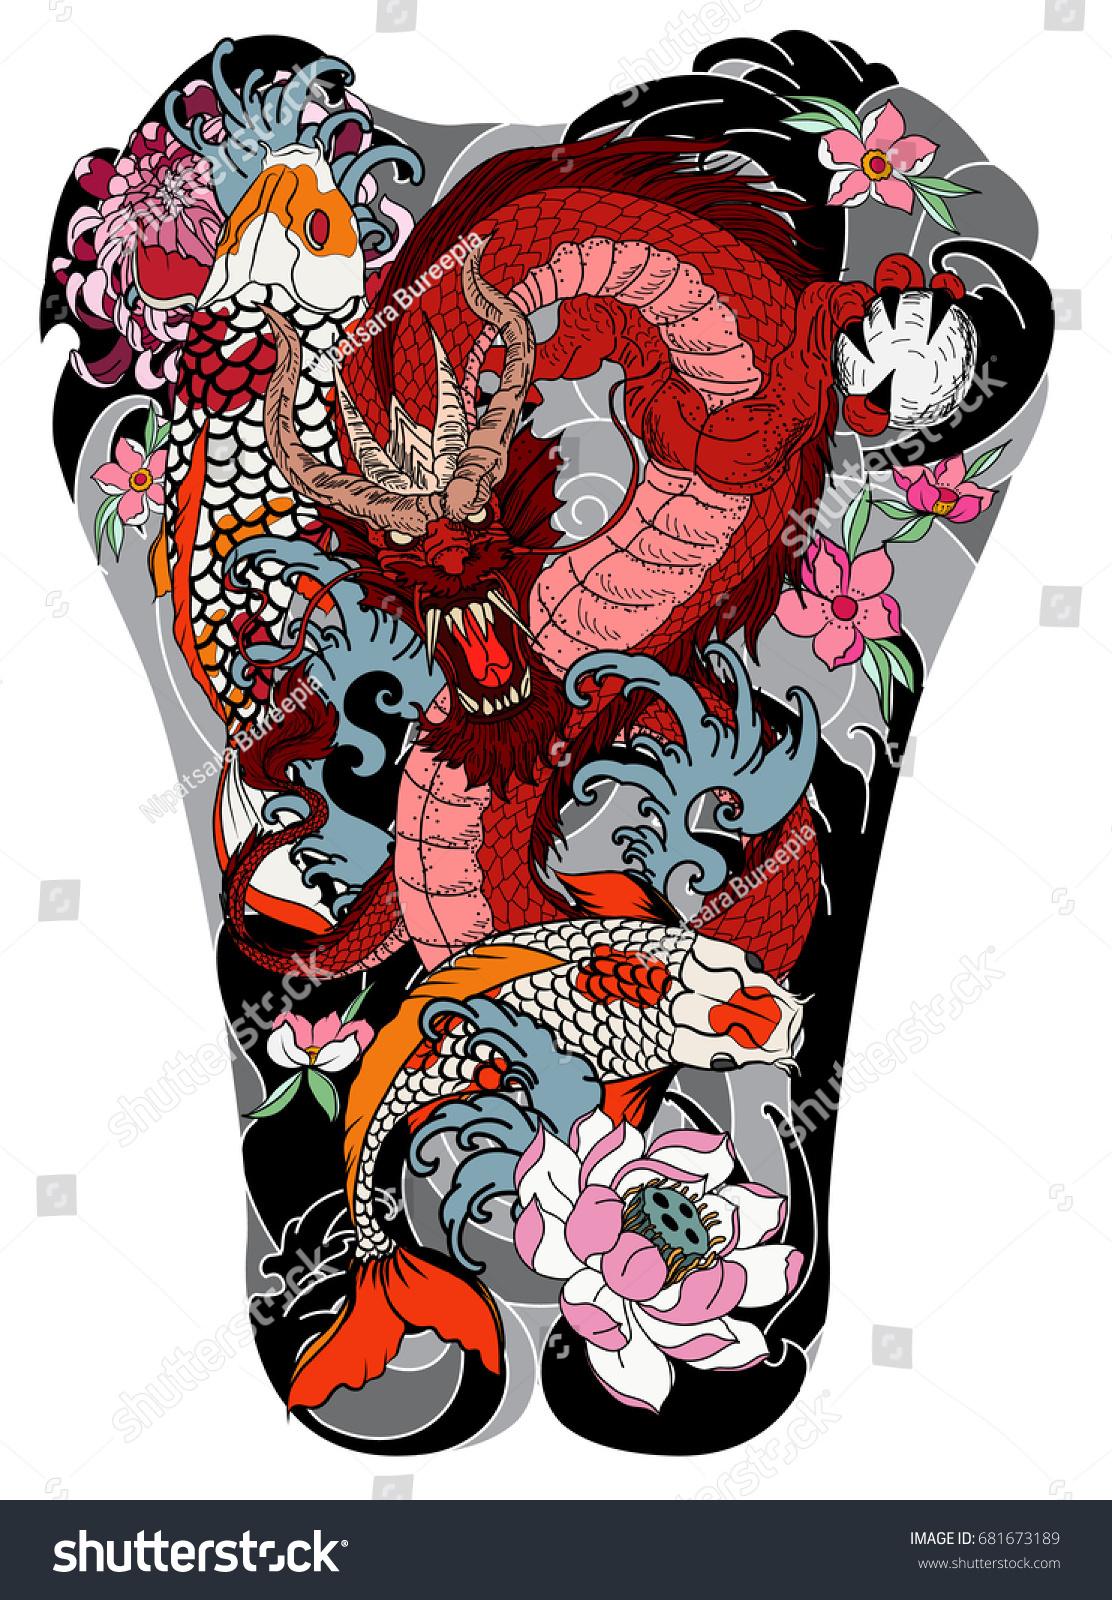 Dragon koi fish peony chrysanthemum rose sakura flower lotus wave dragon and koi fish with peonychrysanthemumrosesakura flowerlotus and izmirmasajfo